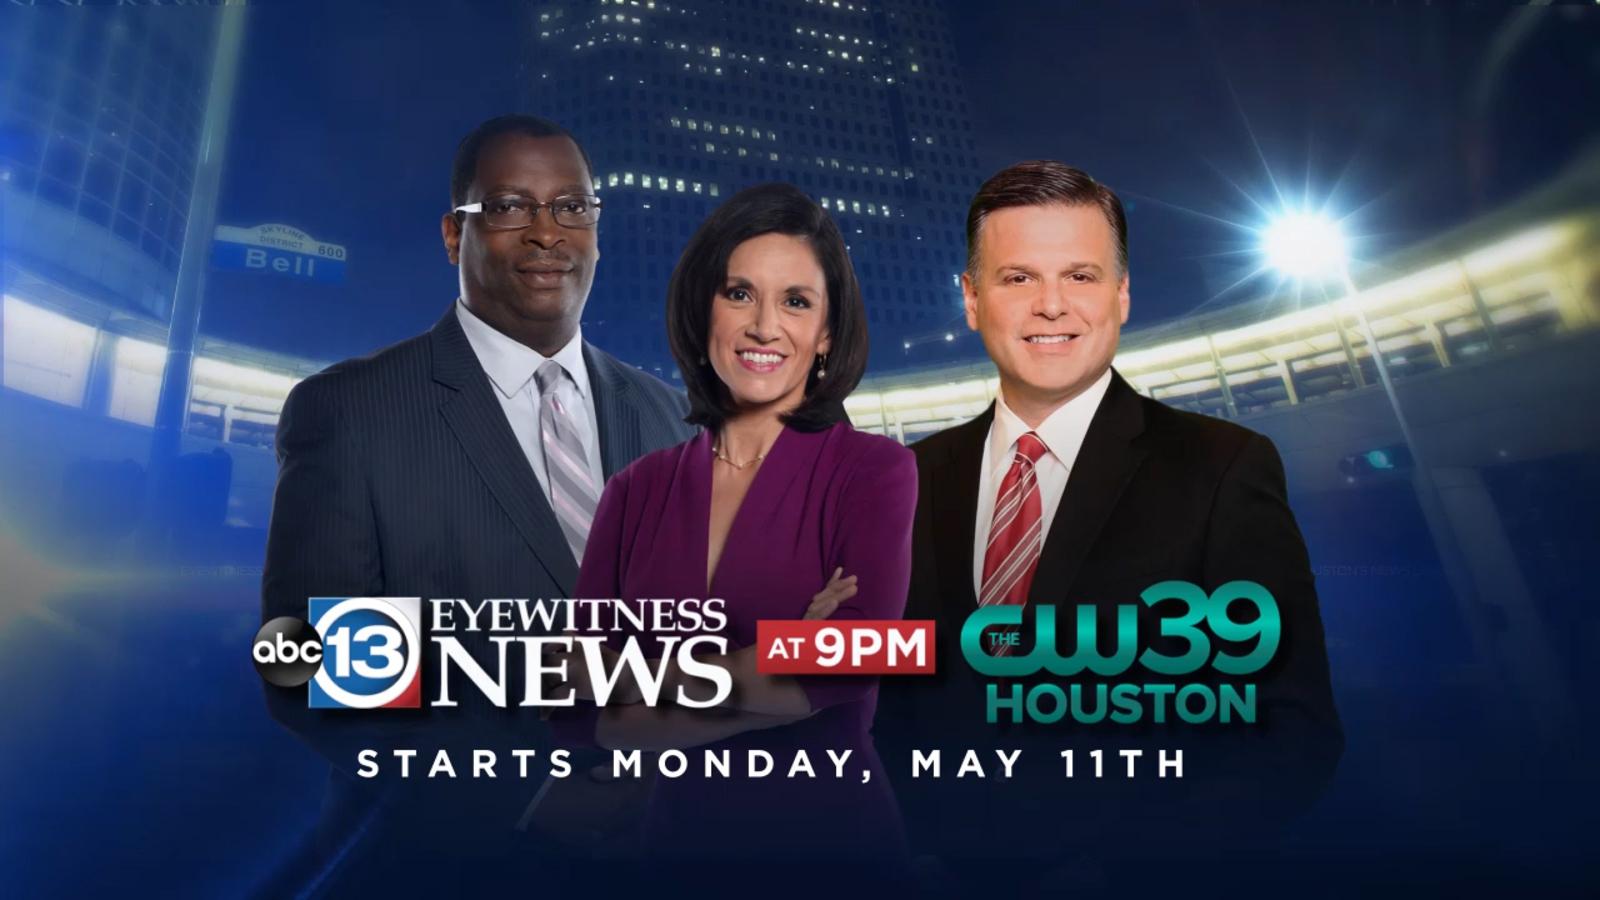 ABC13 Eyewitness News at 9 pm on CW39 debuts Monday, May 11